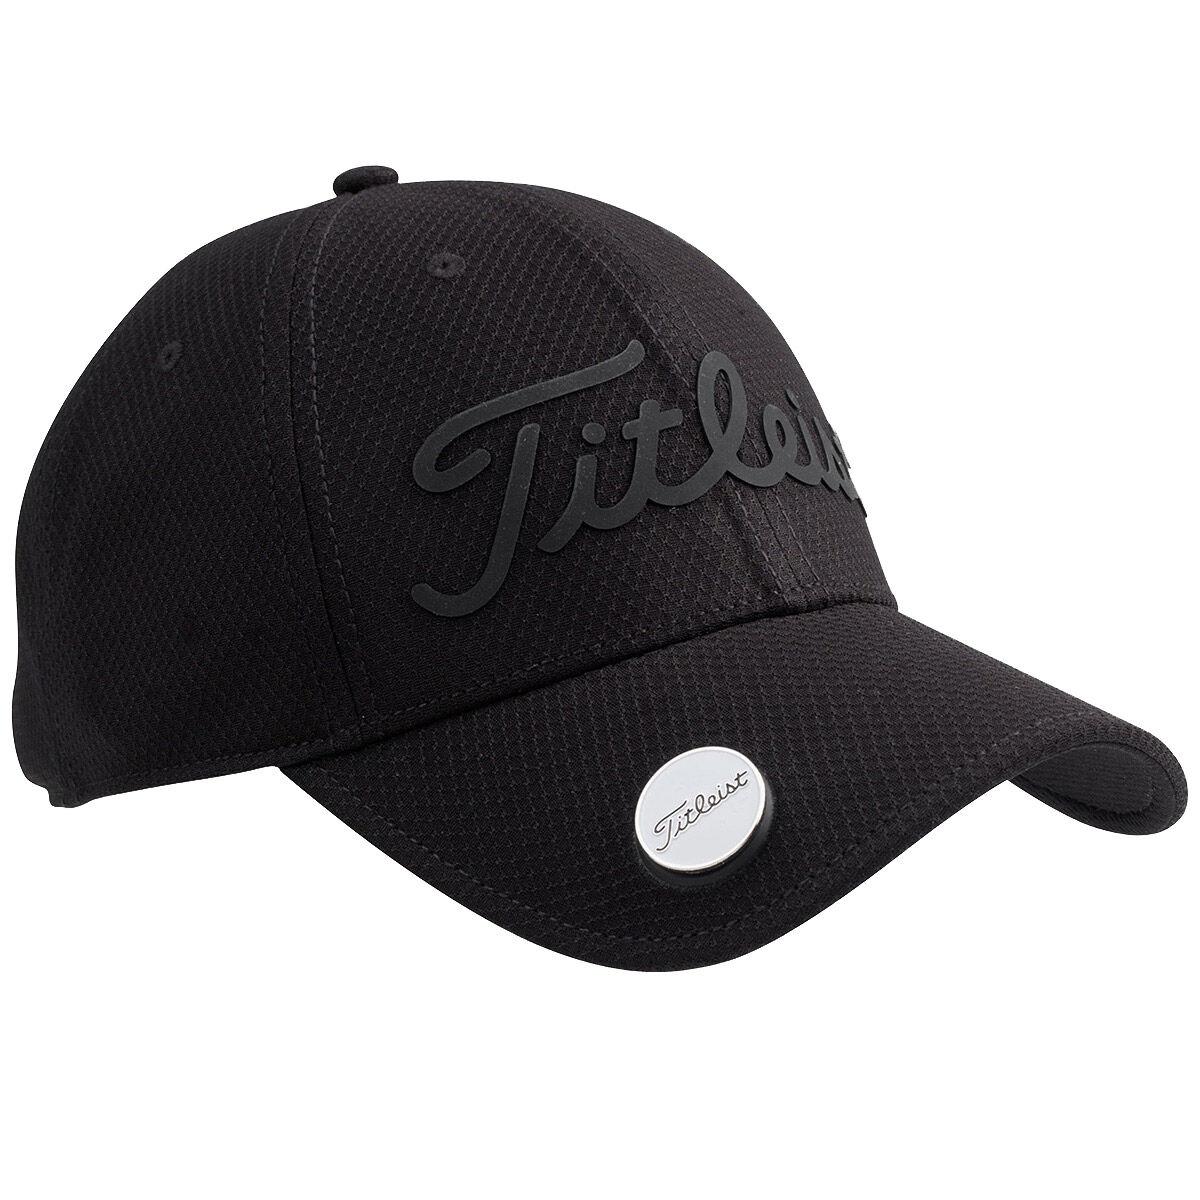 97e24a40a ... ireland wholesale puma puma arsenal baseball cap junior boys caps and  hats c1c3c f2cac clearance titleist ...